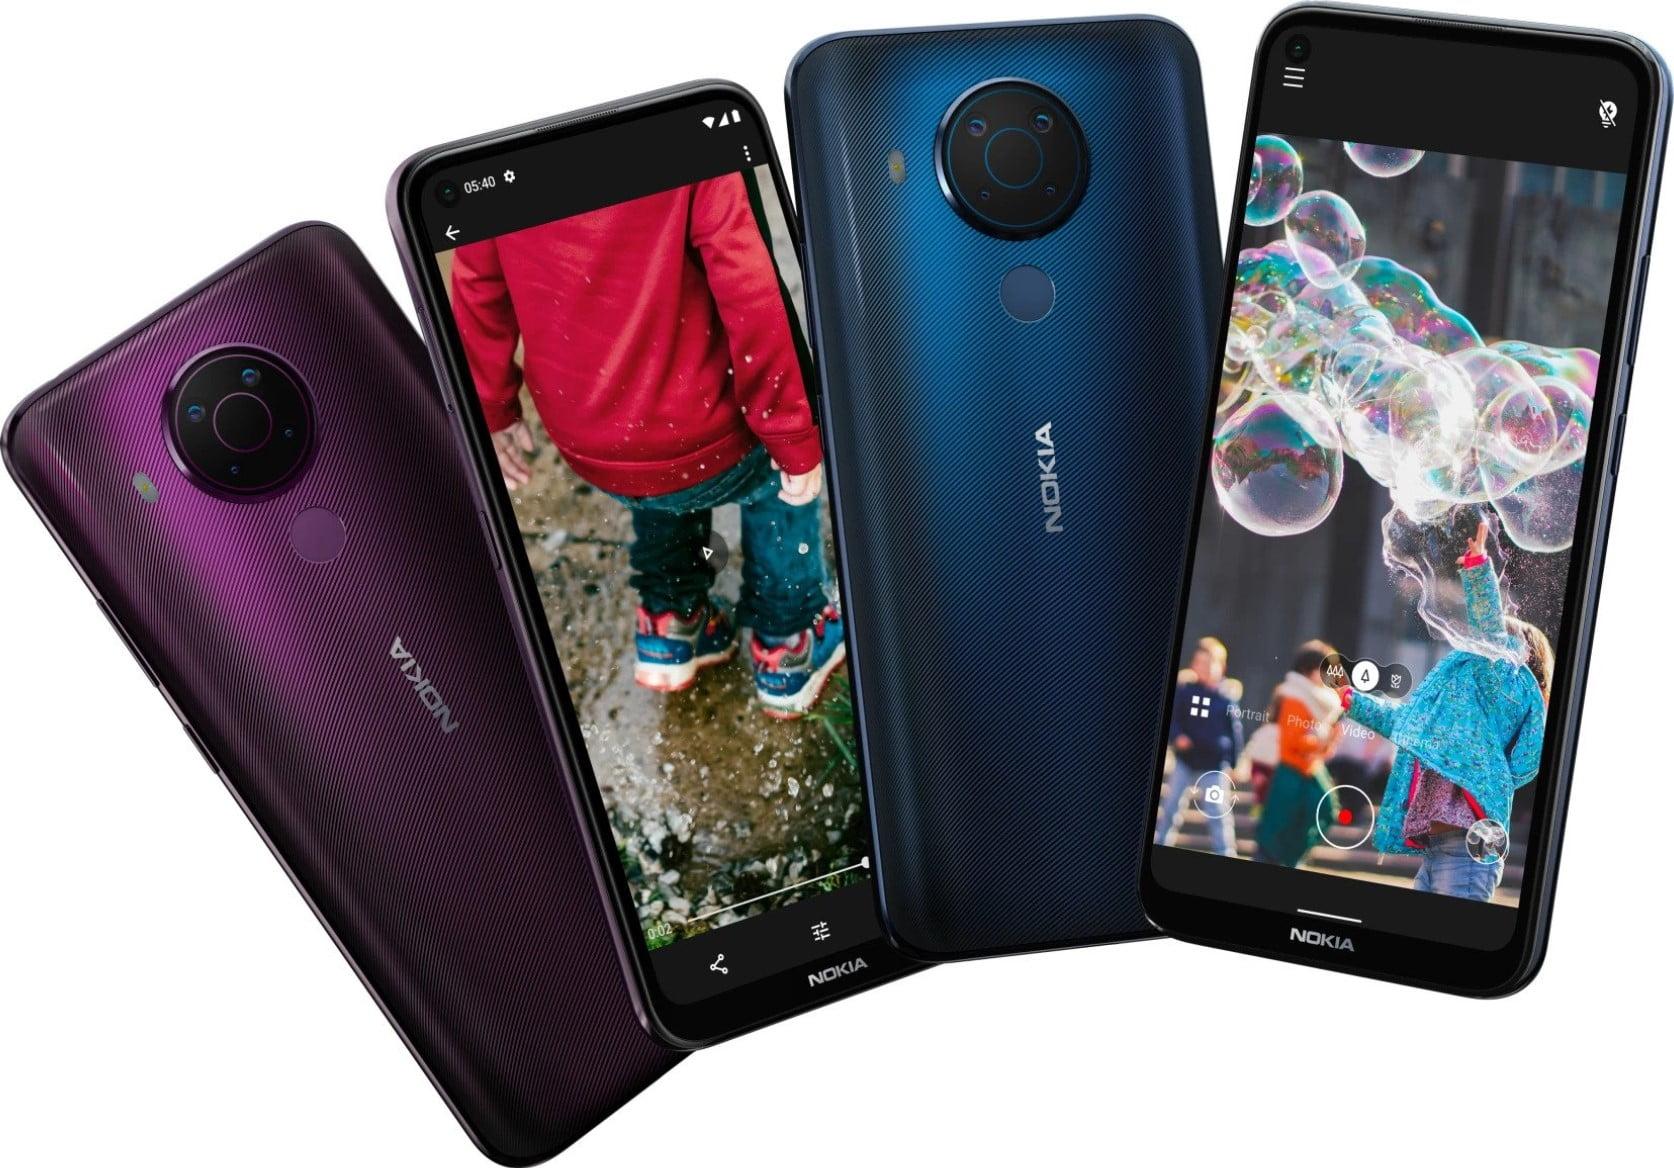 Mkopa Nokia Phones